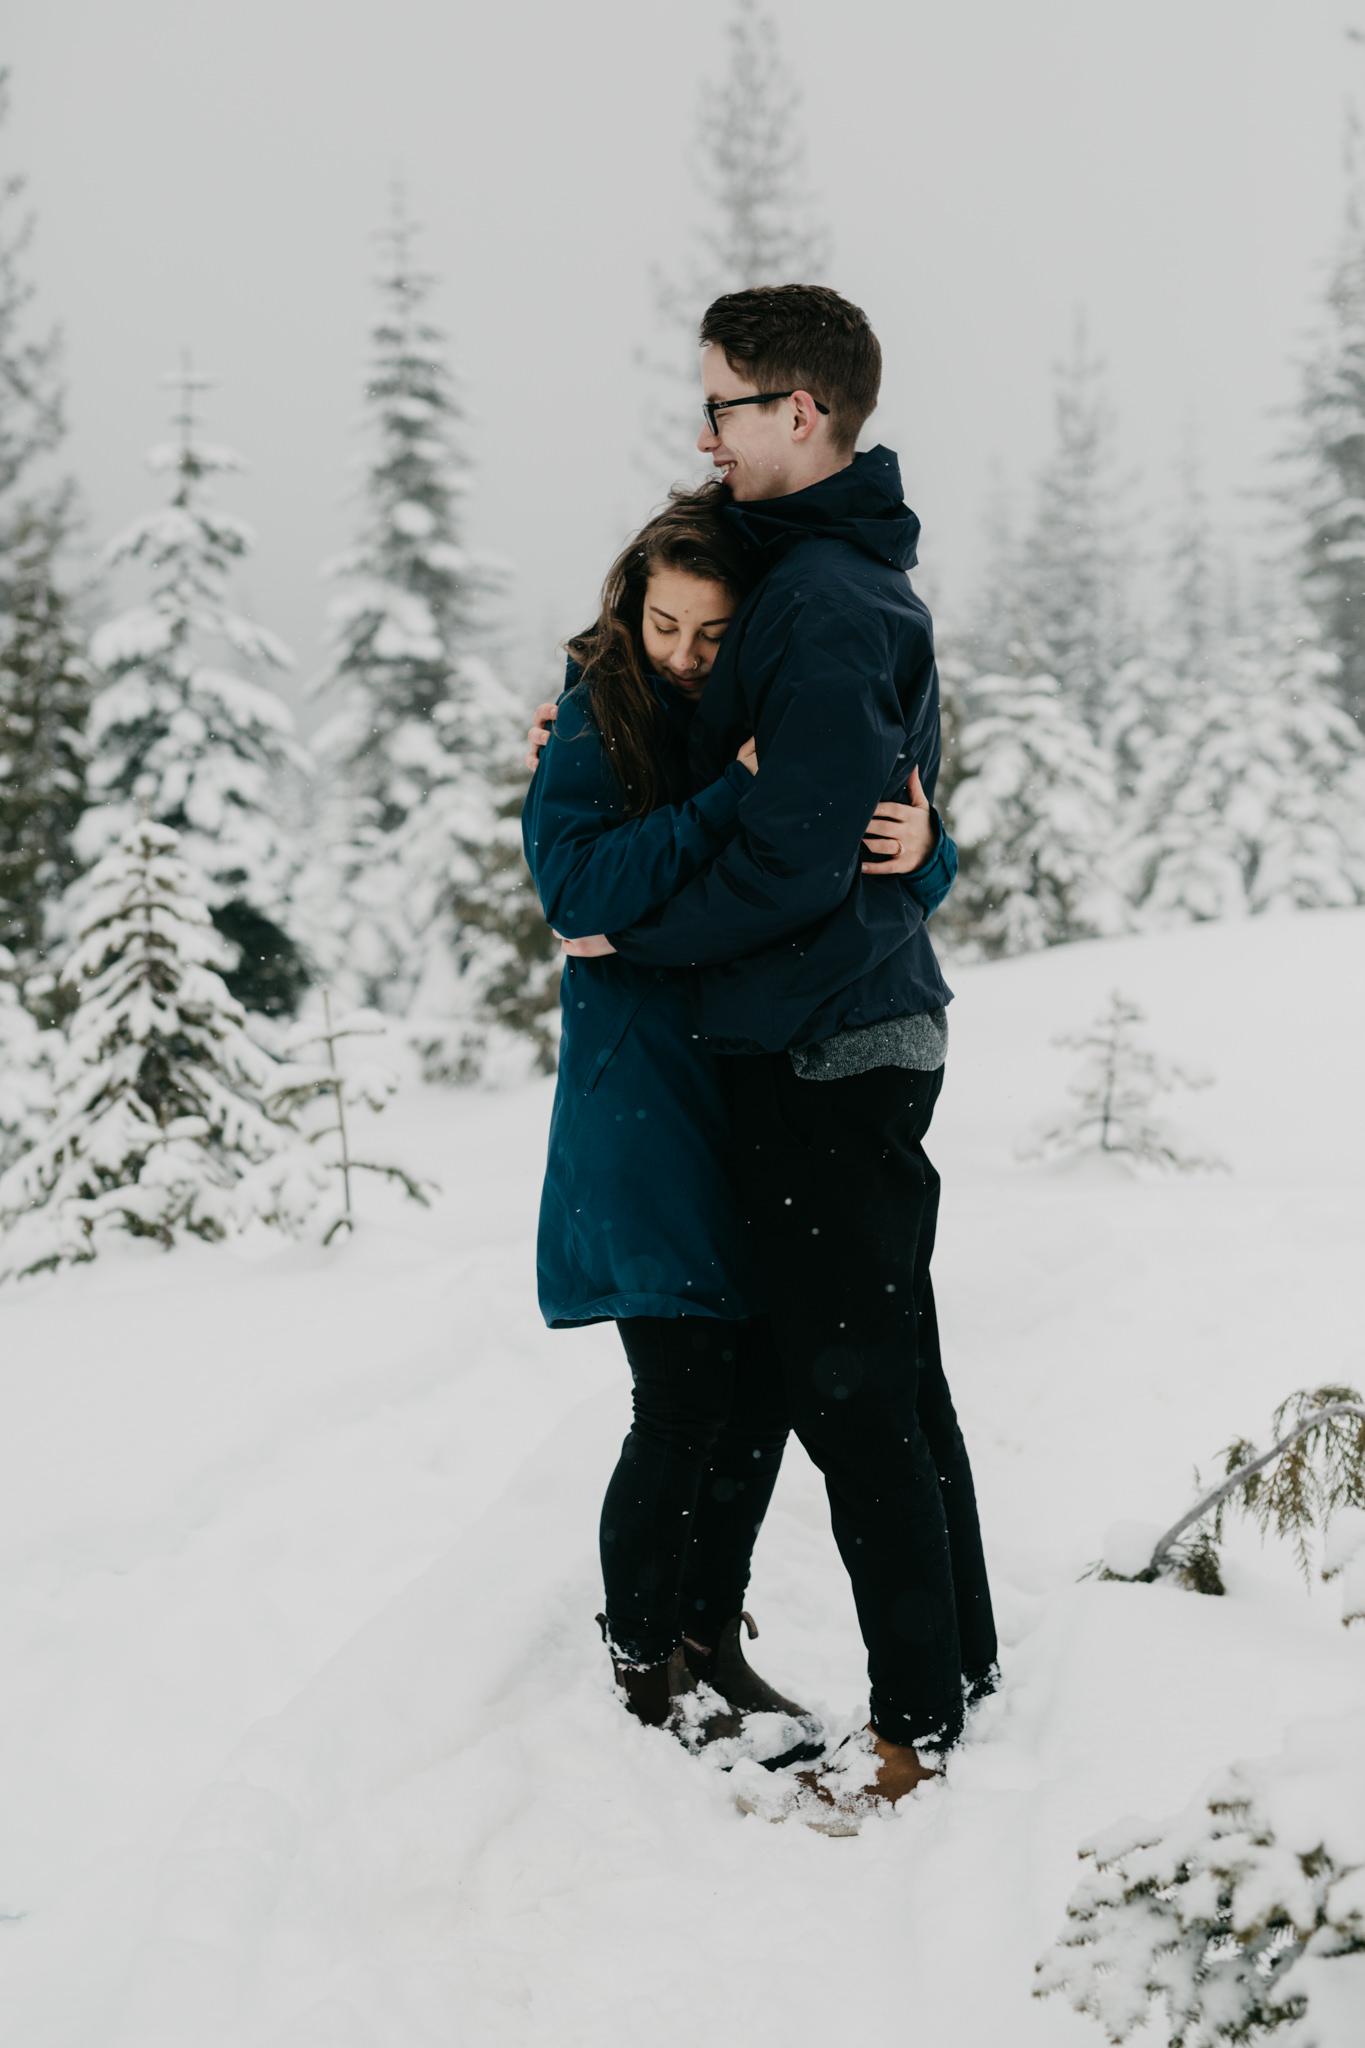 greg+jade-mount-washington-winter-engagement099.JPG